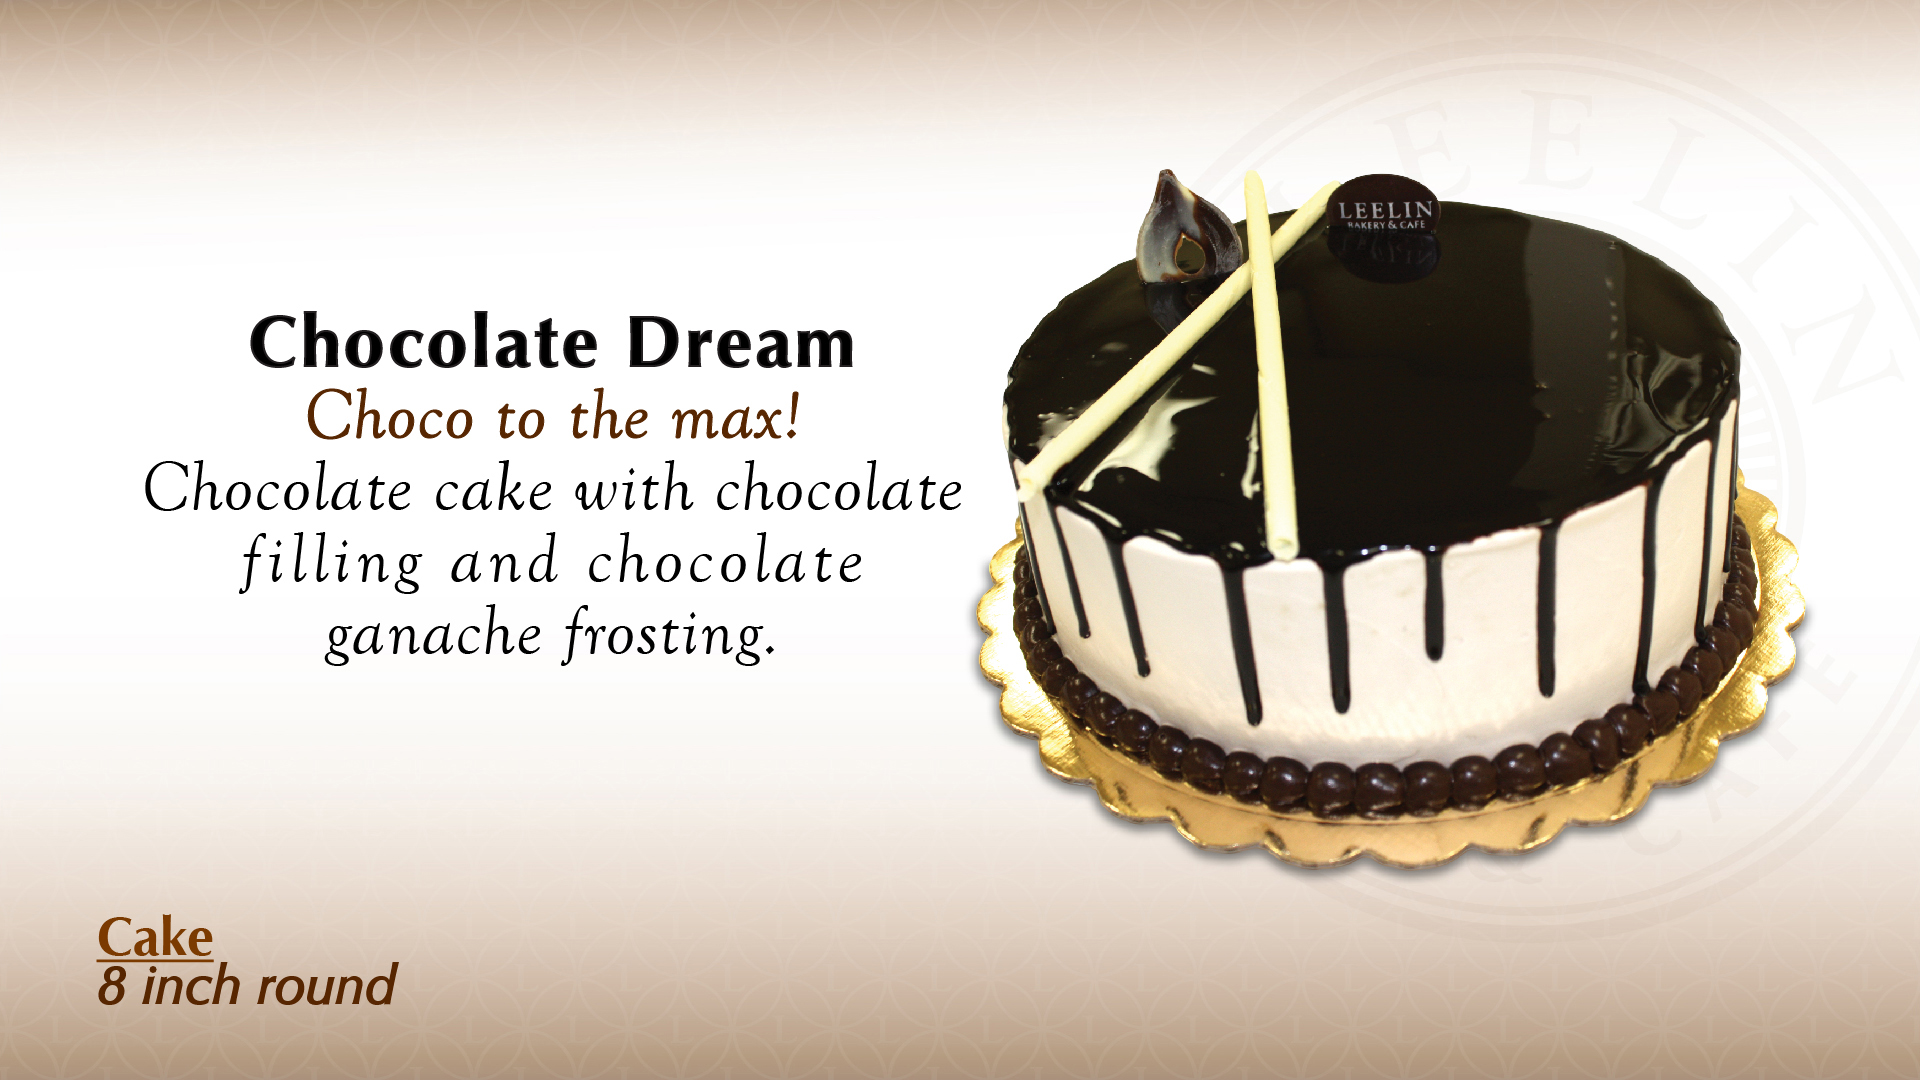 033 Chocolate Dream 1920x1080.jpg